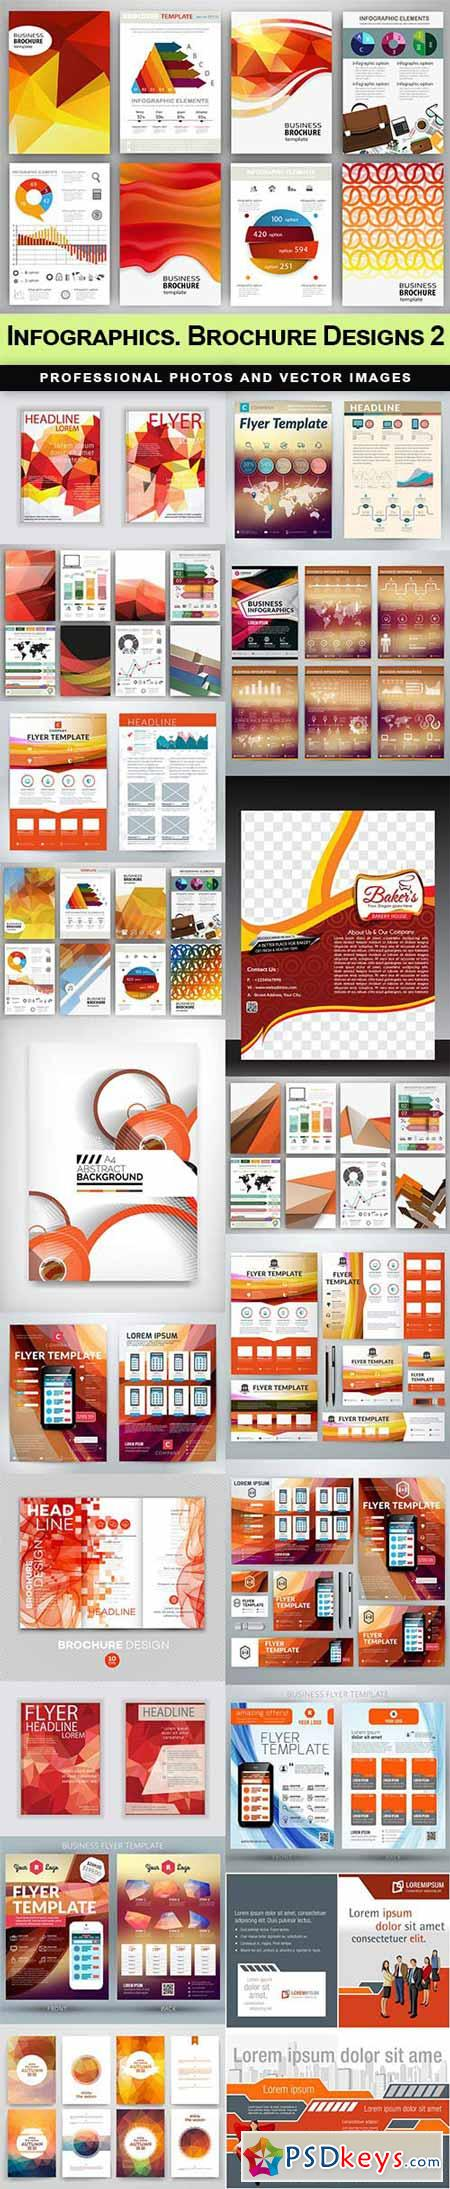 Infographics. Brochure Designs 2 - 23 EPS